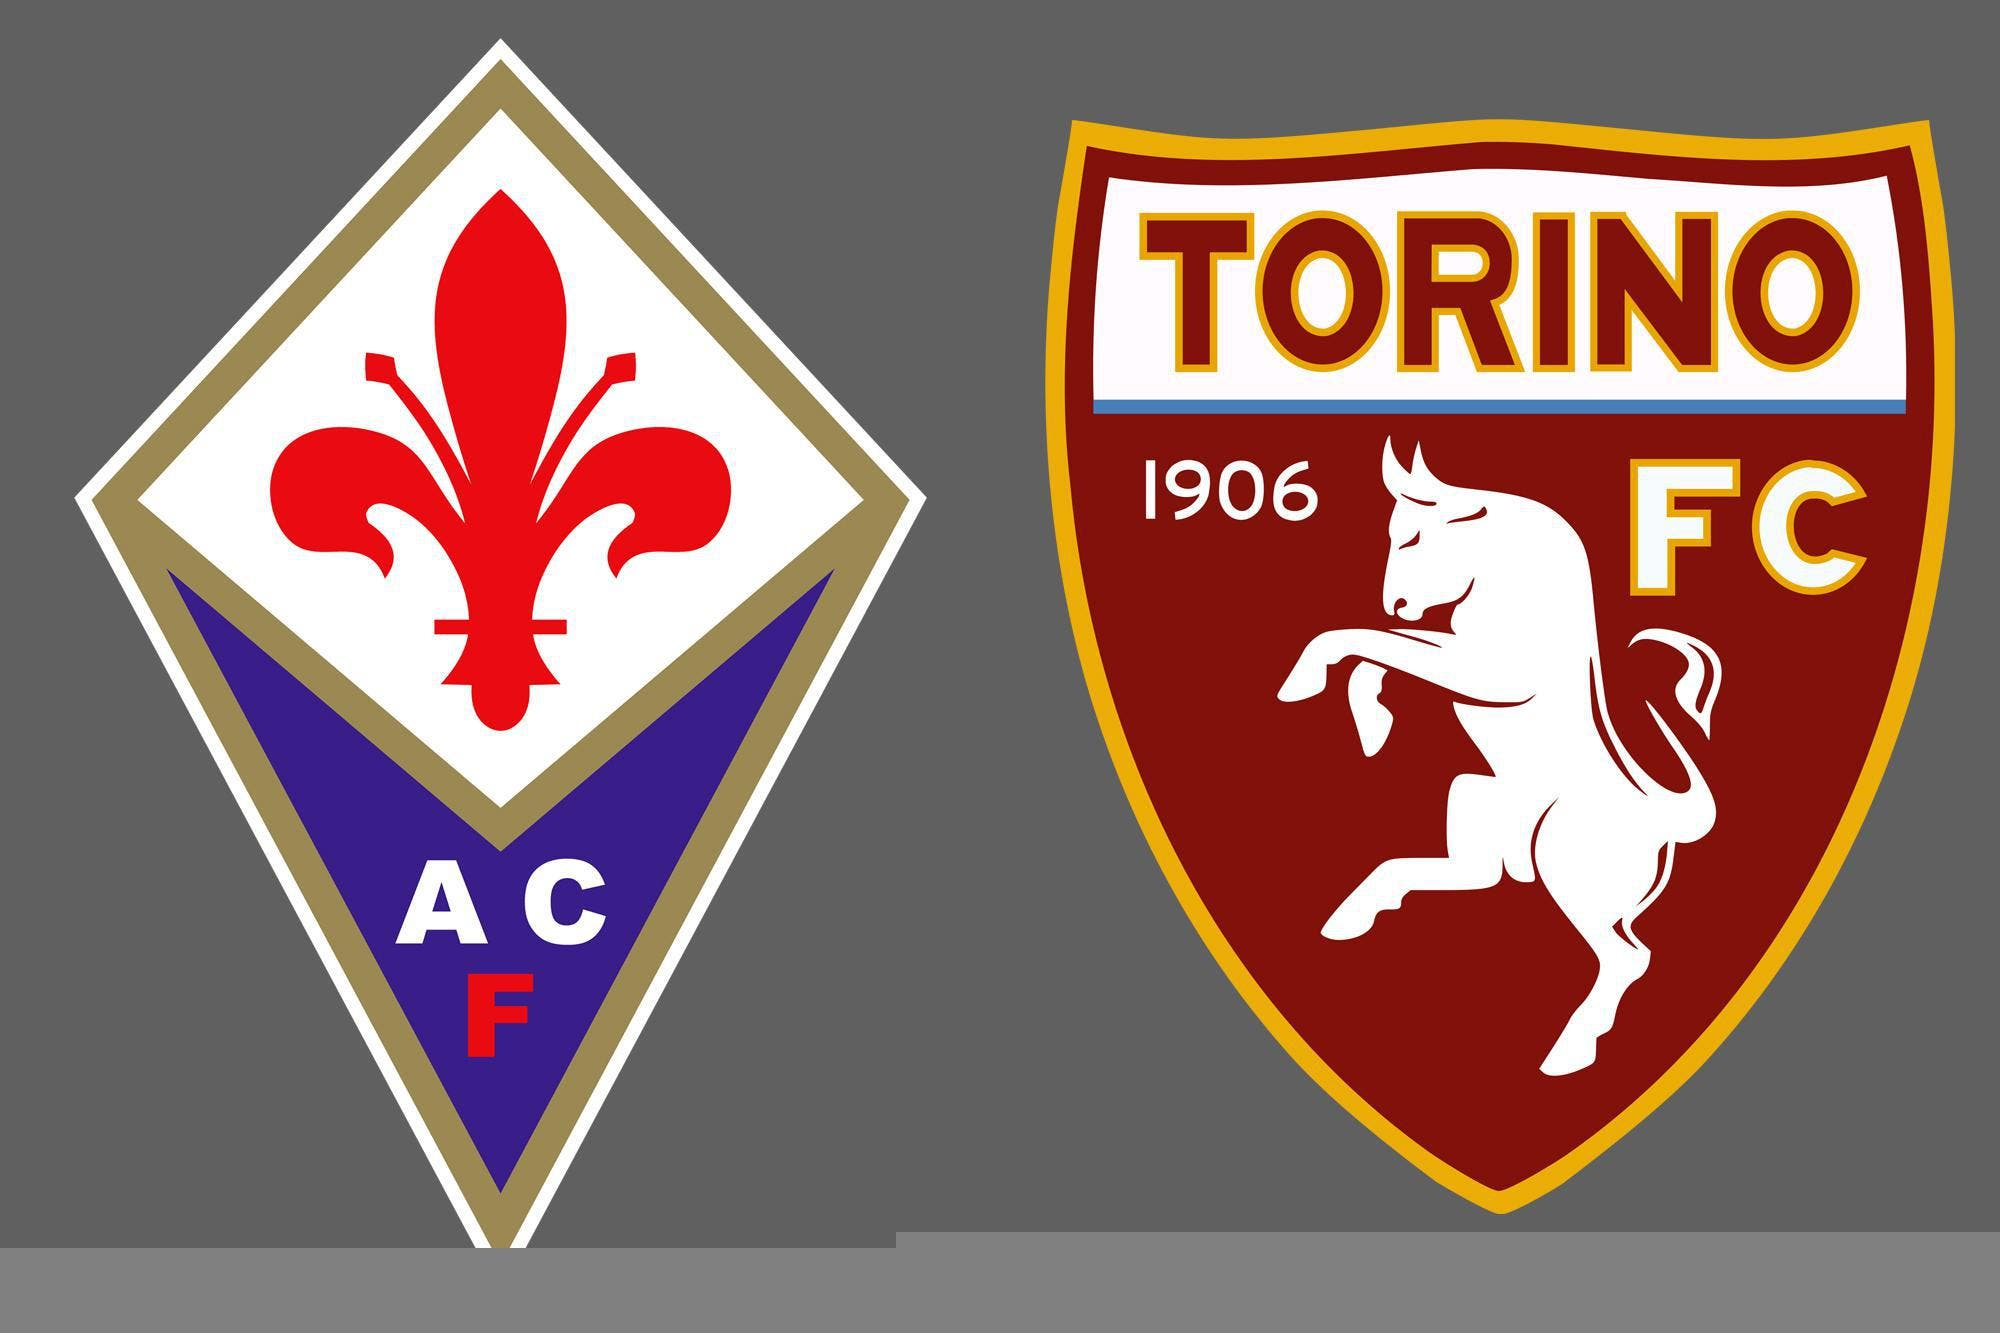 Fiorentina-Torino, Serie A de Italia: el partido de la jornada 1